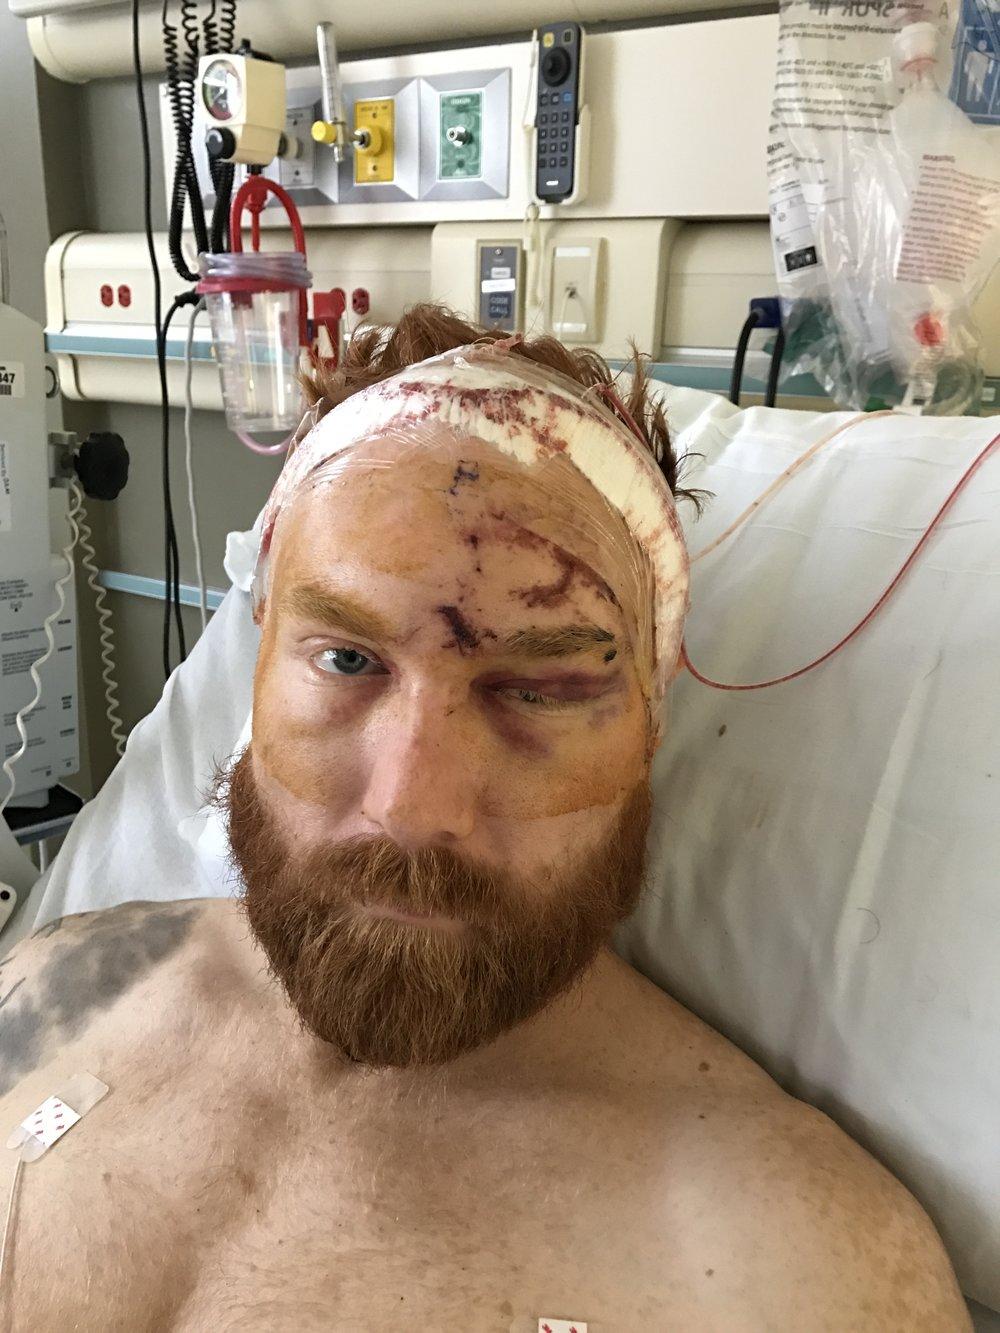 After first surgery